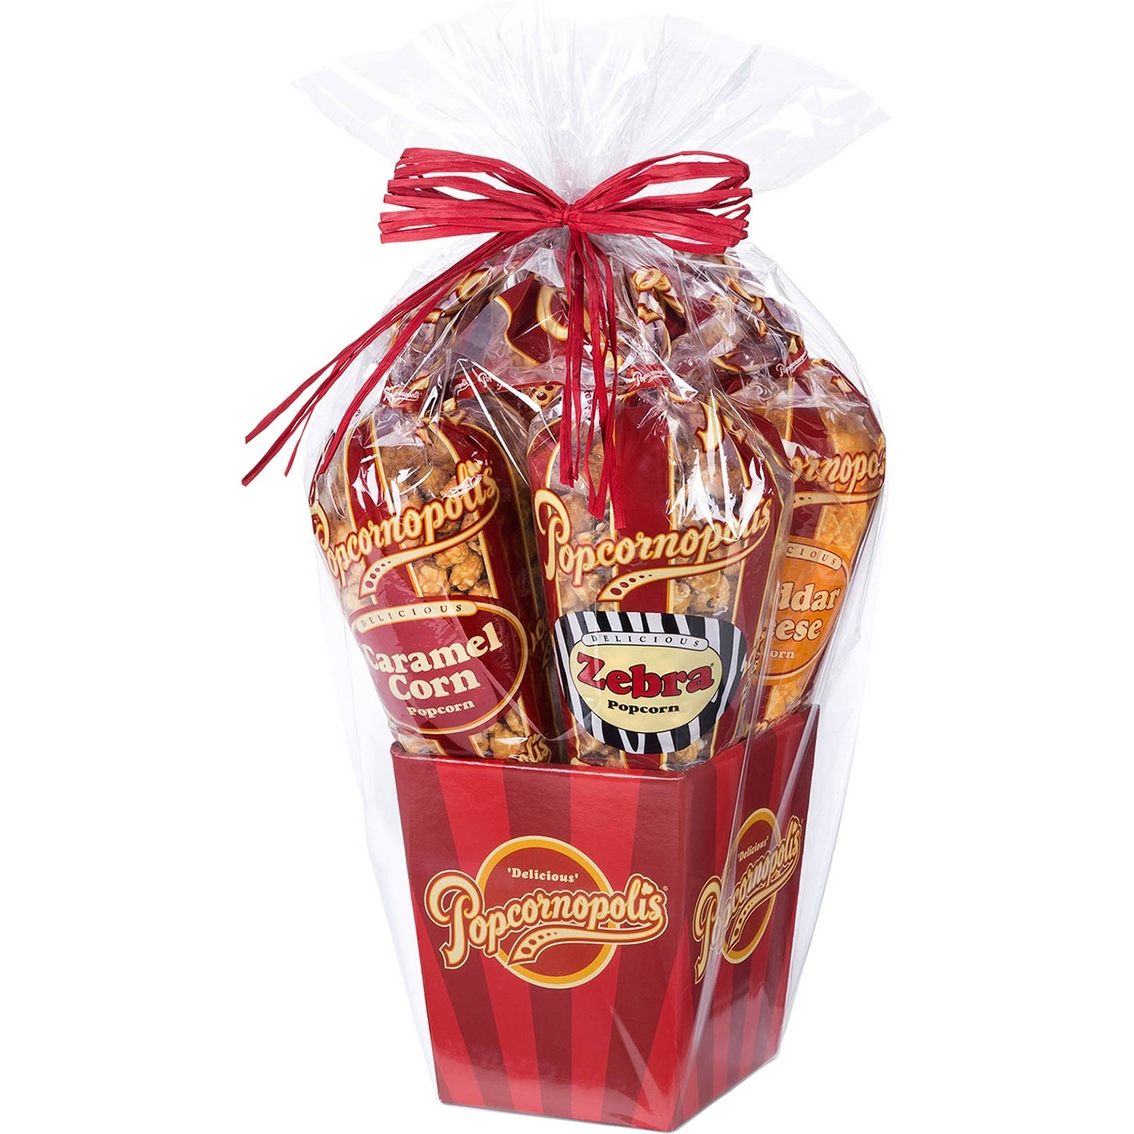 Popcornopolis Gourmet Popcorn Five Cone Gift Basket